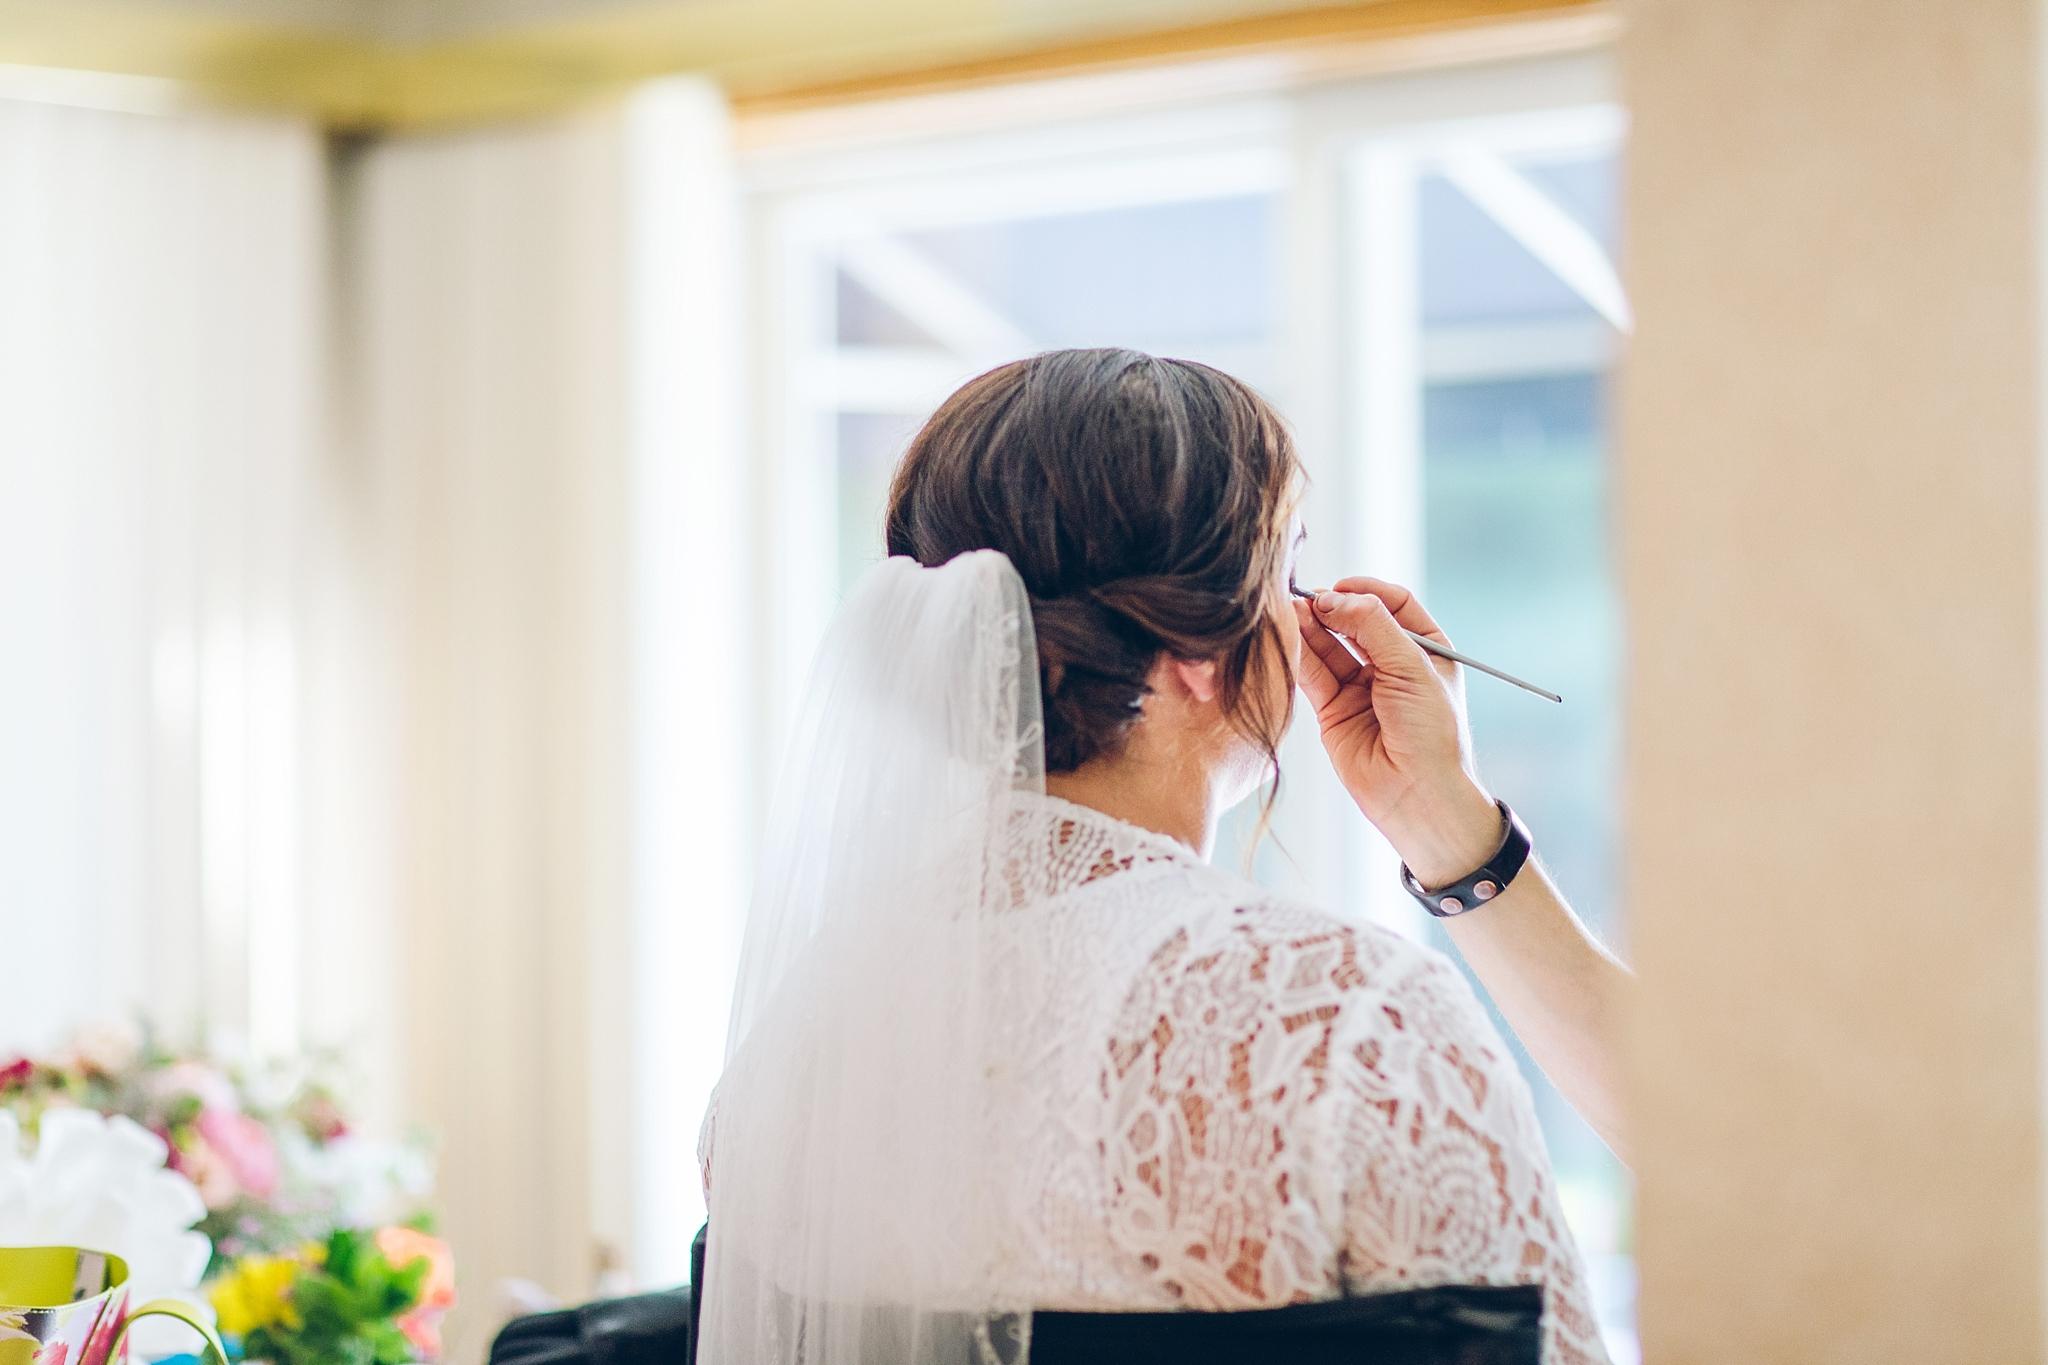 baker-lofts-holland-michigan-wedding-photographer_0297.jpg